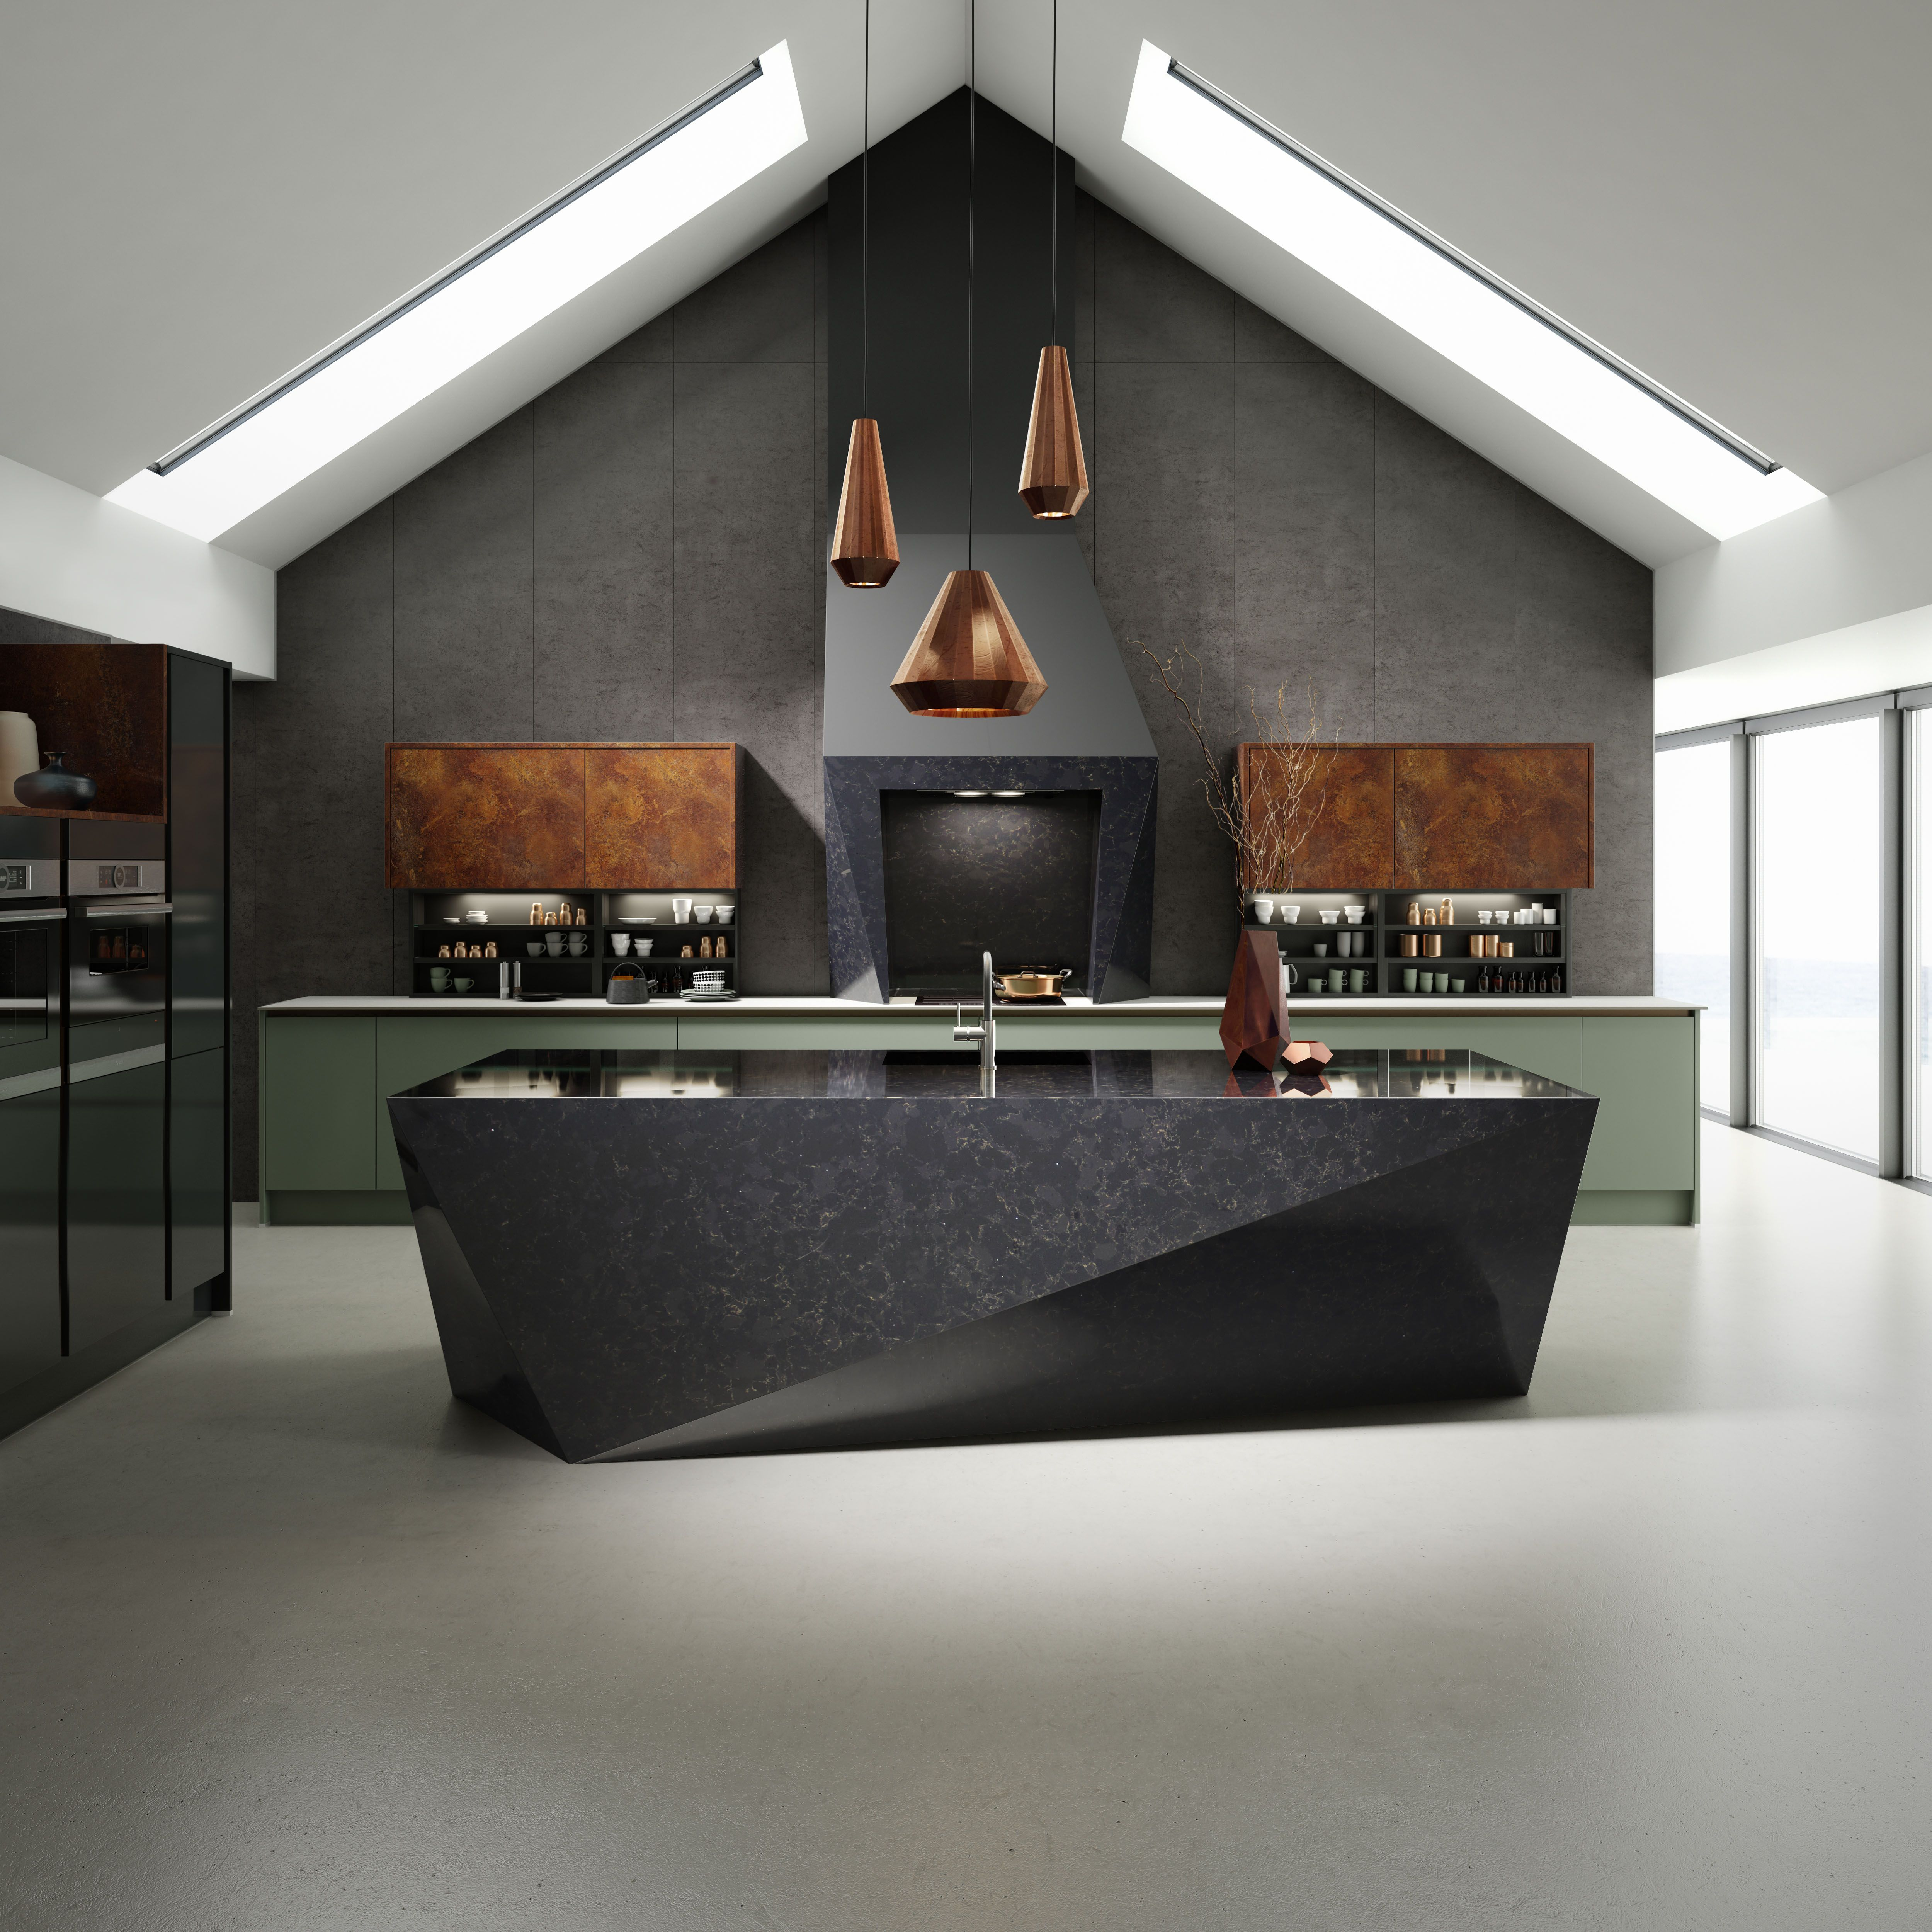 Milano Elements Kitchen Available at Wren Kitchens